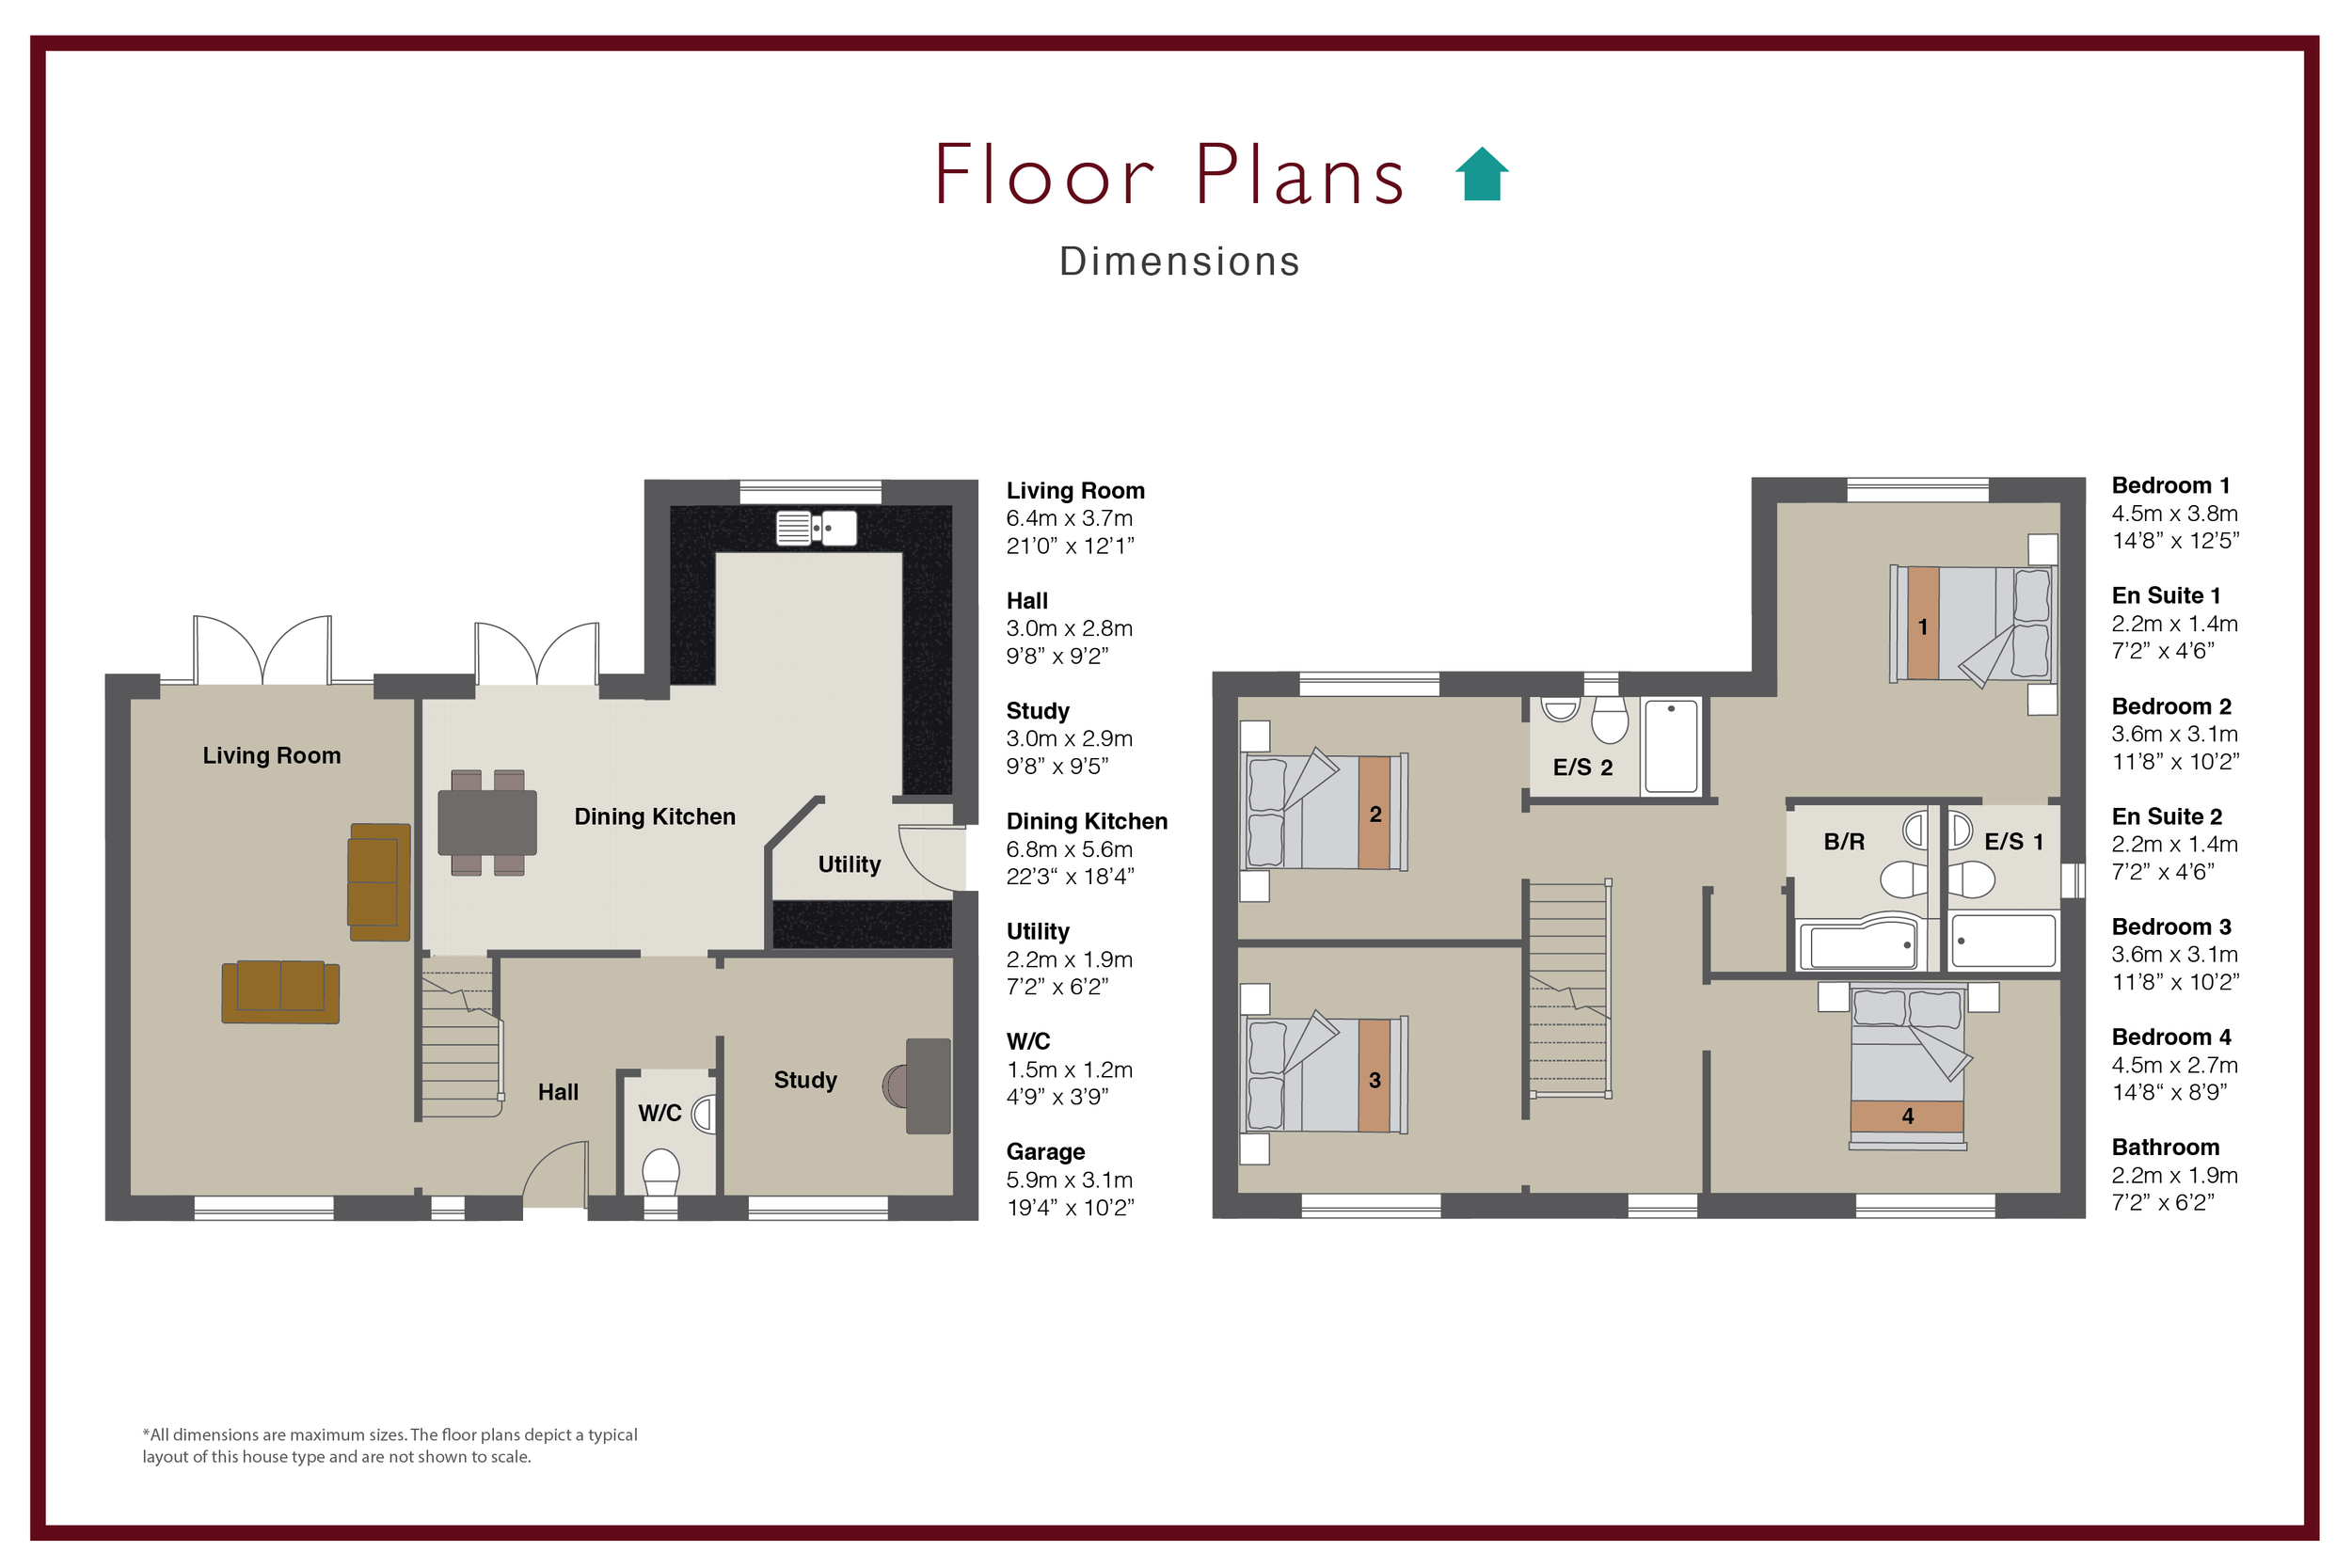 Floorplans_3x2 The Langham.png